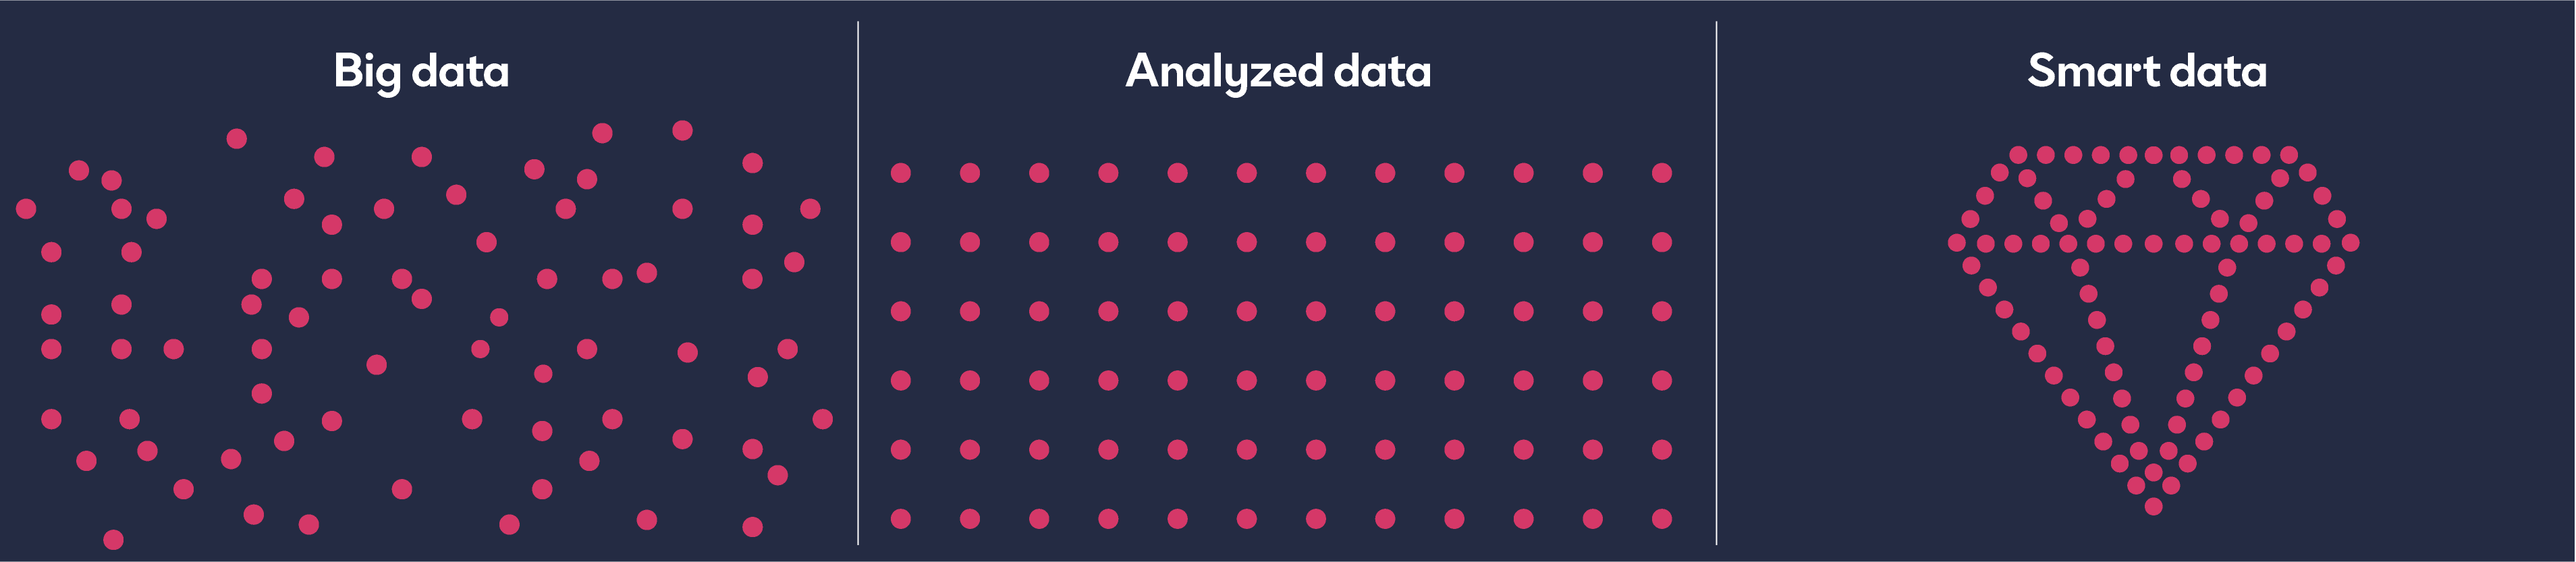 big data, smart data